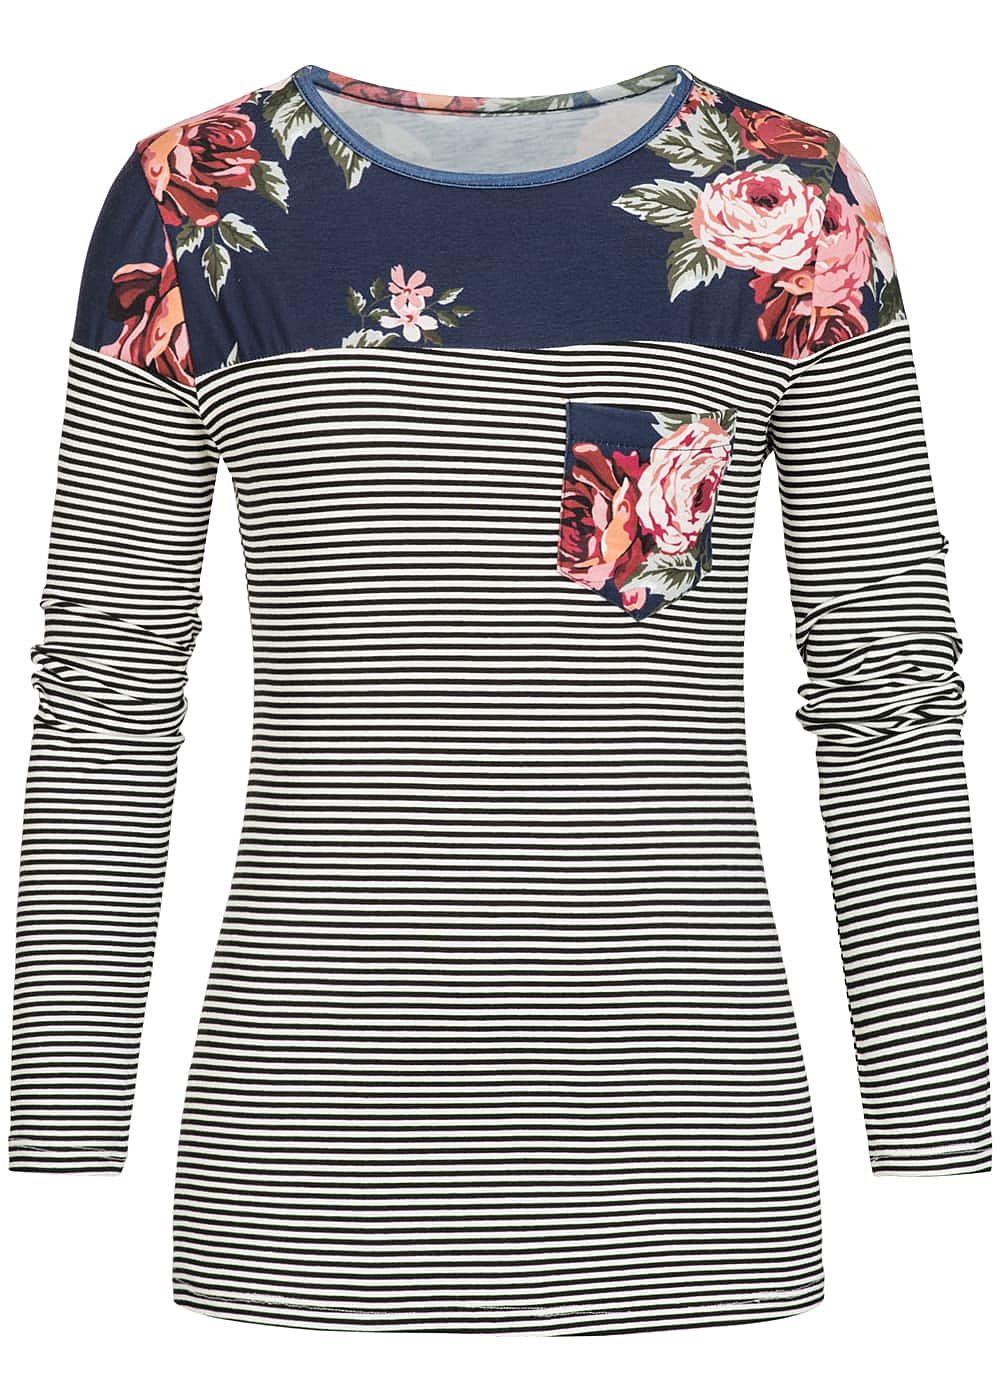 styleboom fashion damen longsleeve shirt blumen muster gestreift weiss schwarz 77onlineshop. Black Bedroom Furniture Sets. Home Design Ideas